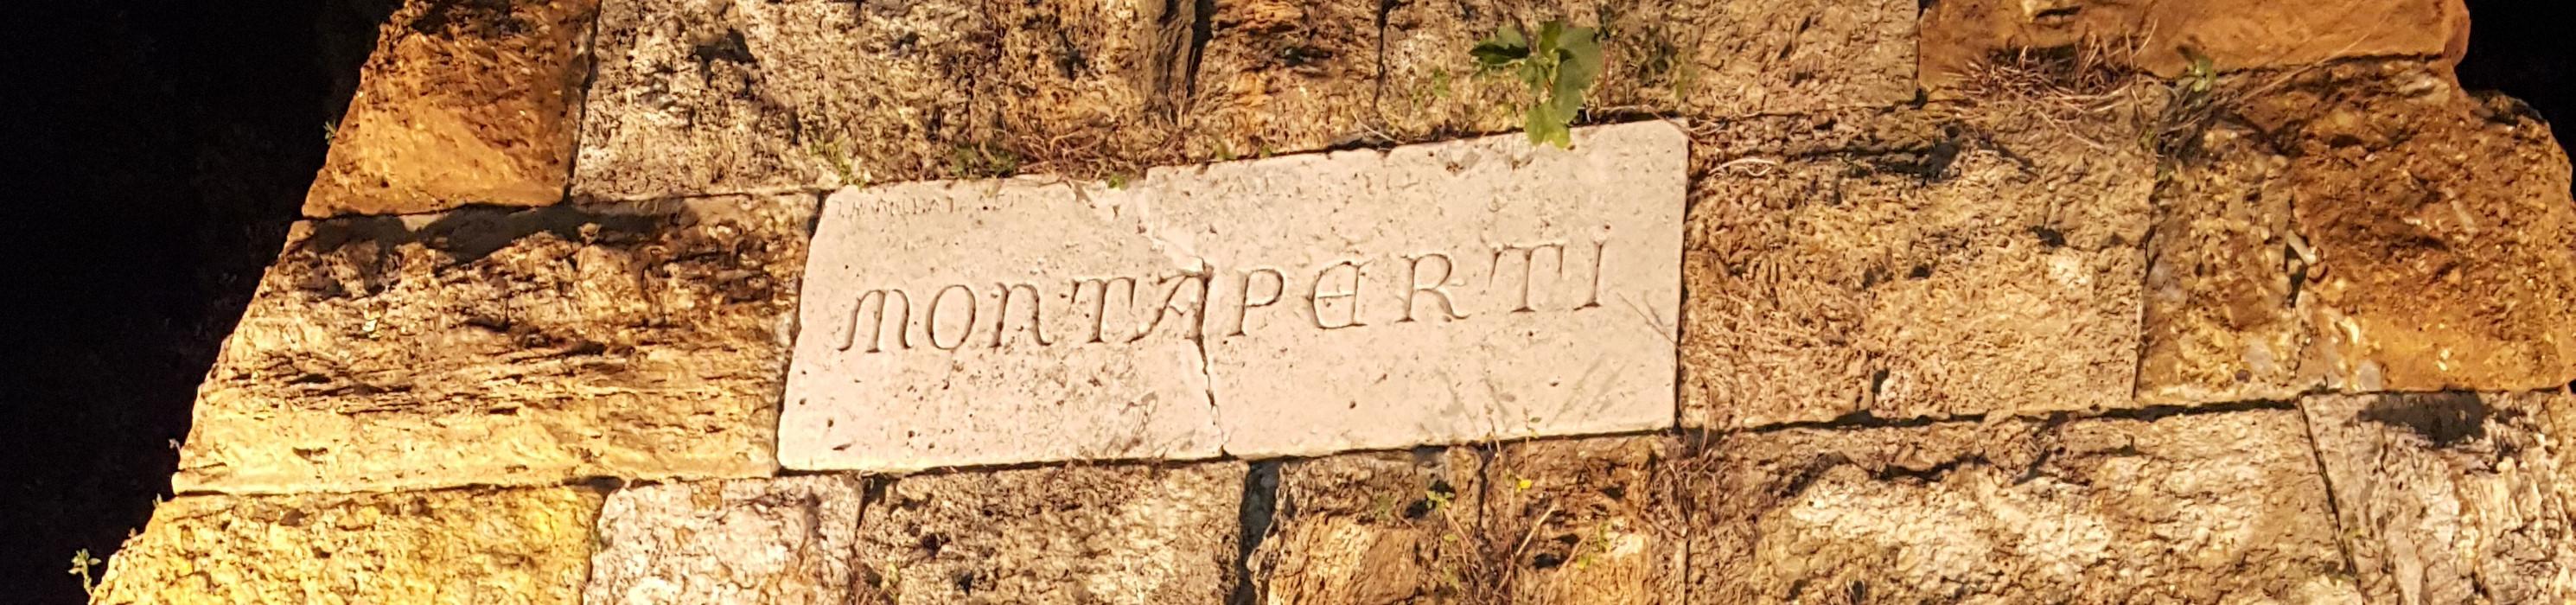 montaperti_cippo_crop